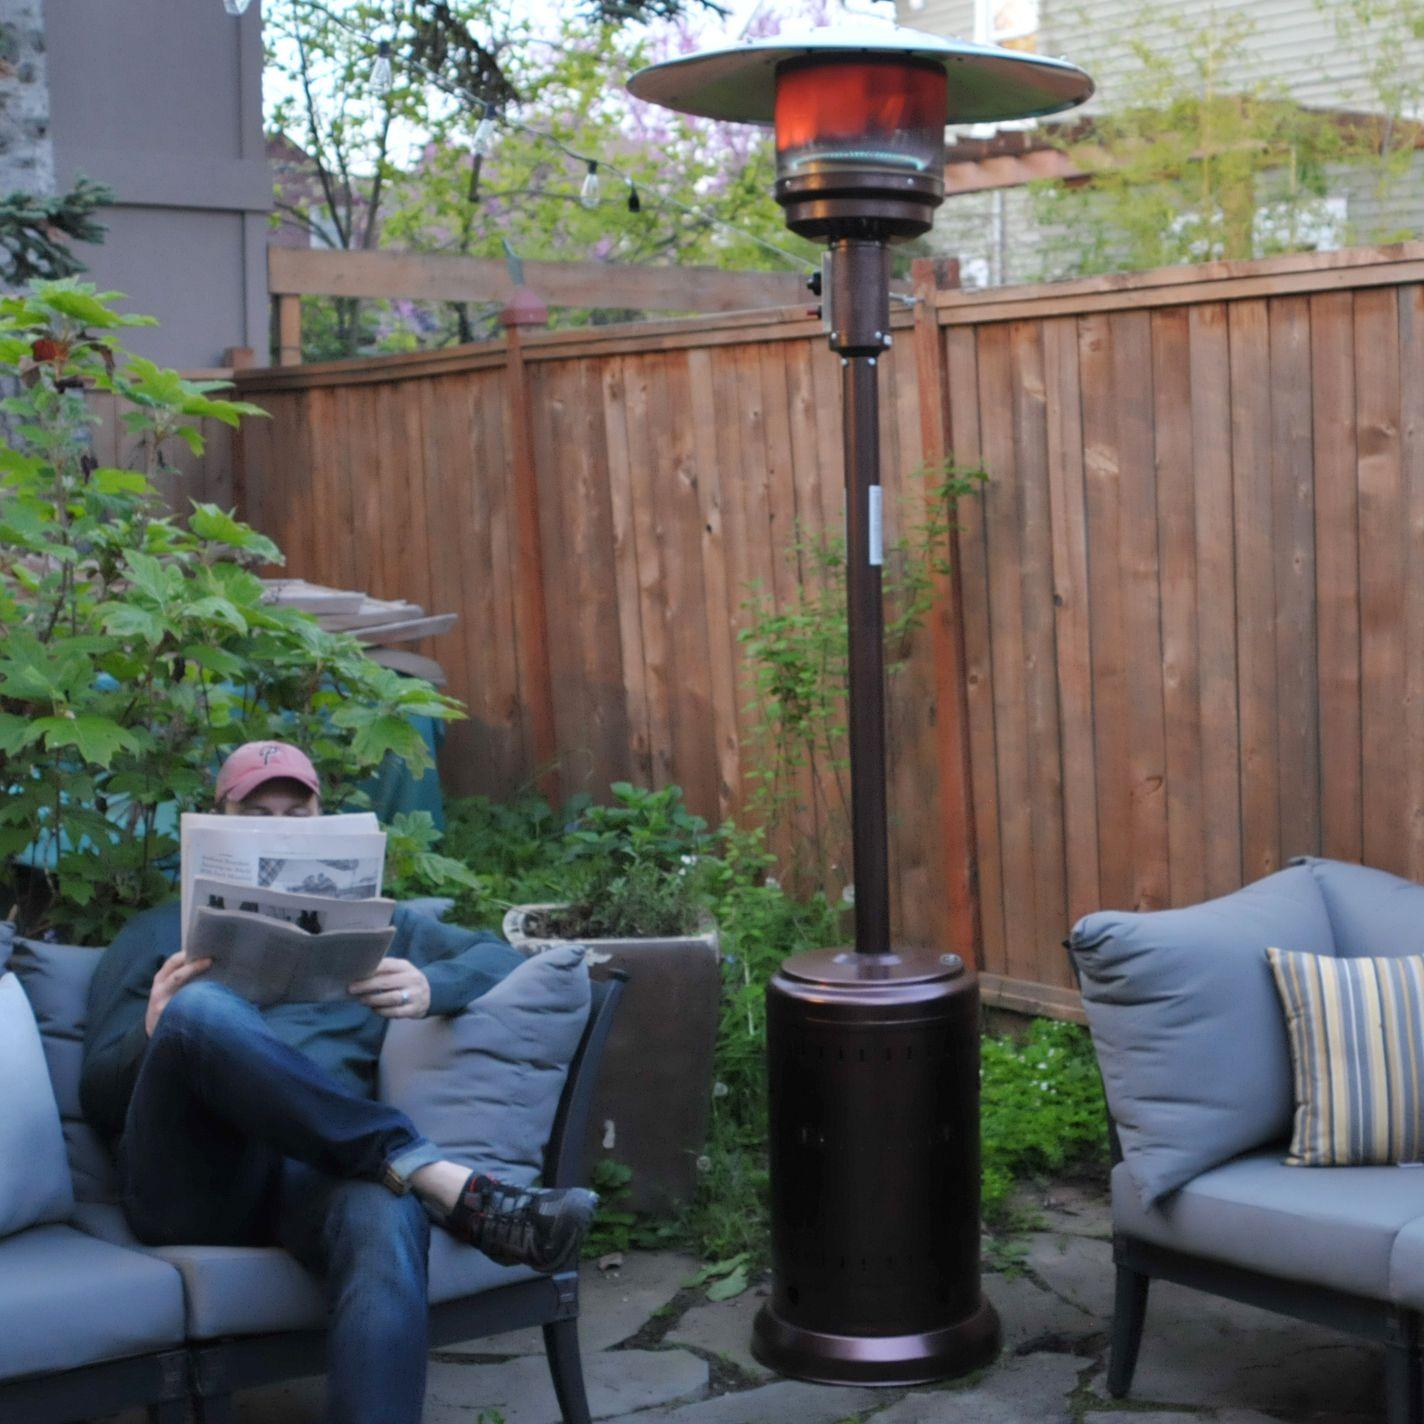 Fire Sense Outdoor Patio Heater Review Impressive Heat Classic Design